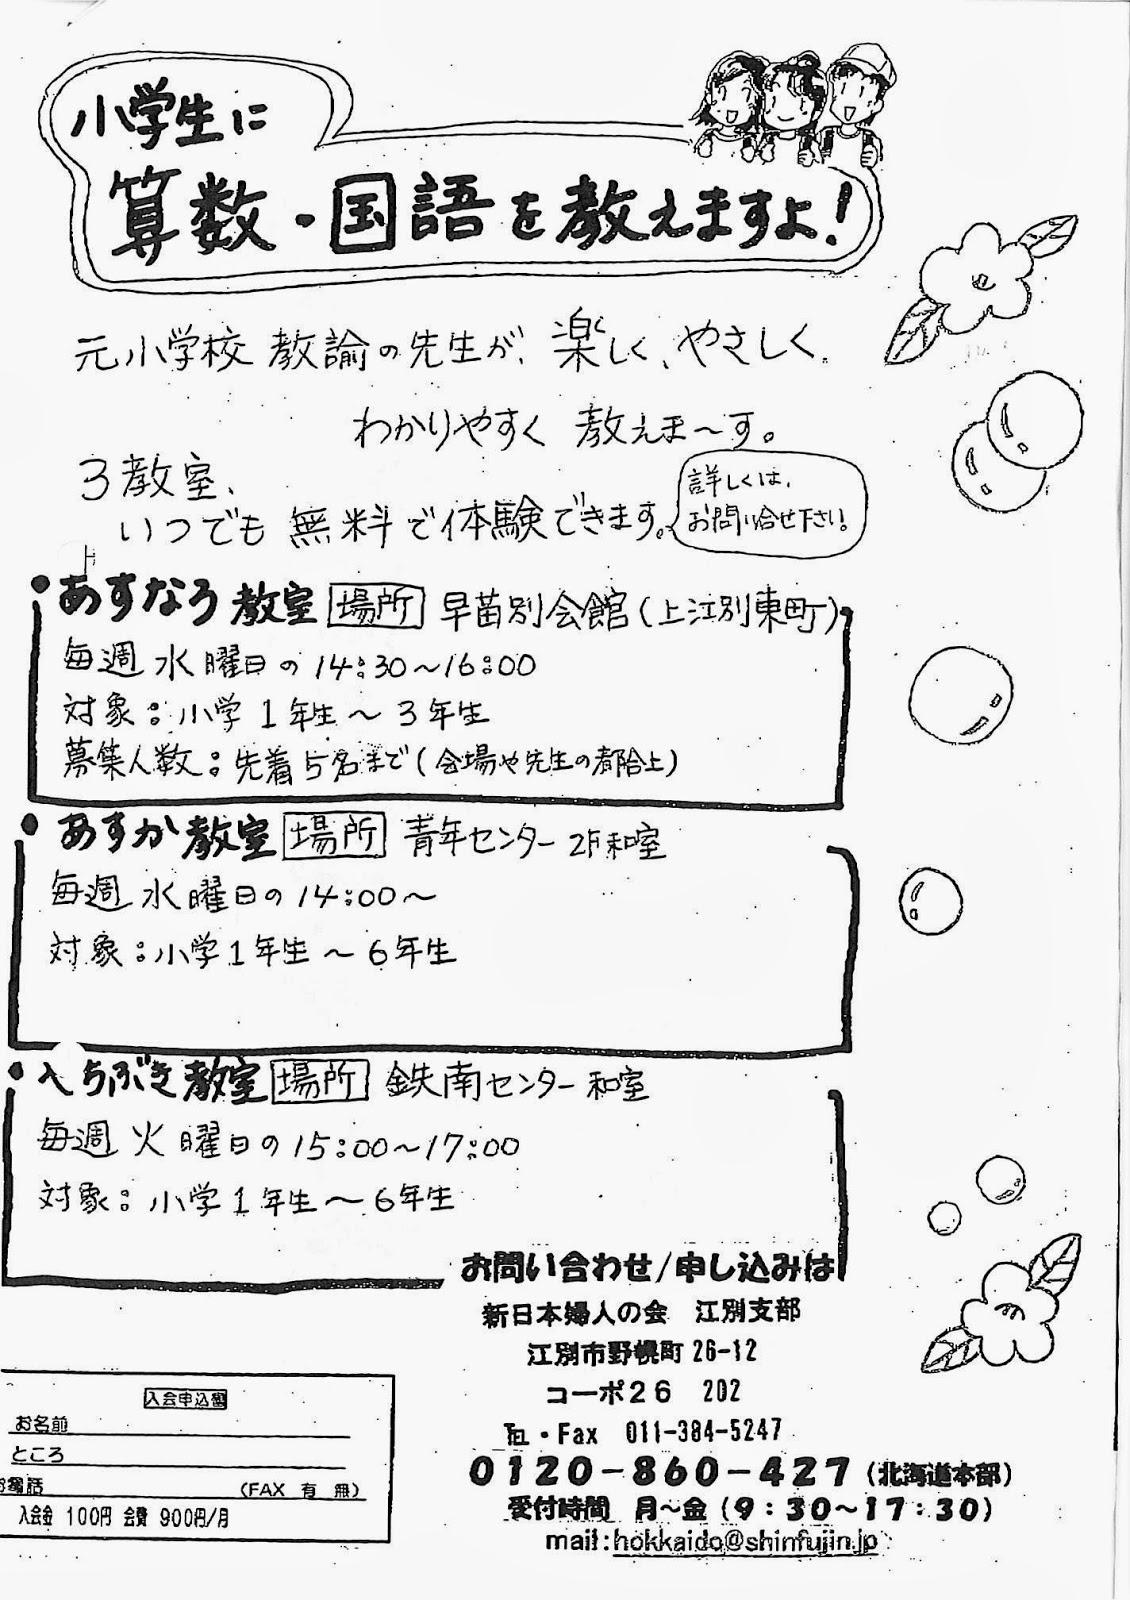 http://shinfujin-hokkaido.com/w/wp-content/uploads/2014/02/5e0e46d3302086864f1a4ab713bcdf851.pdf